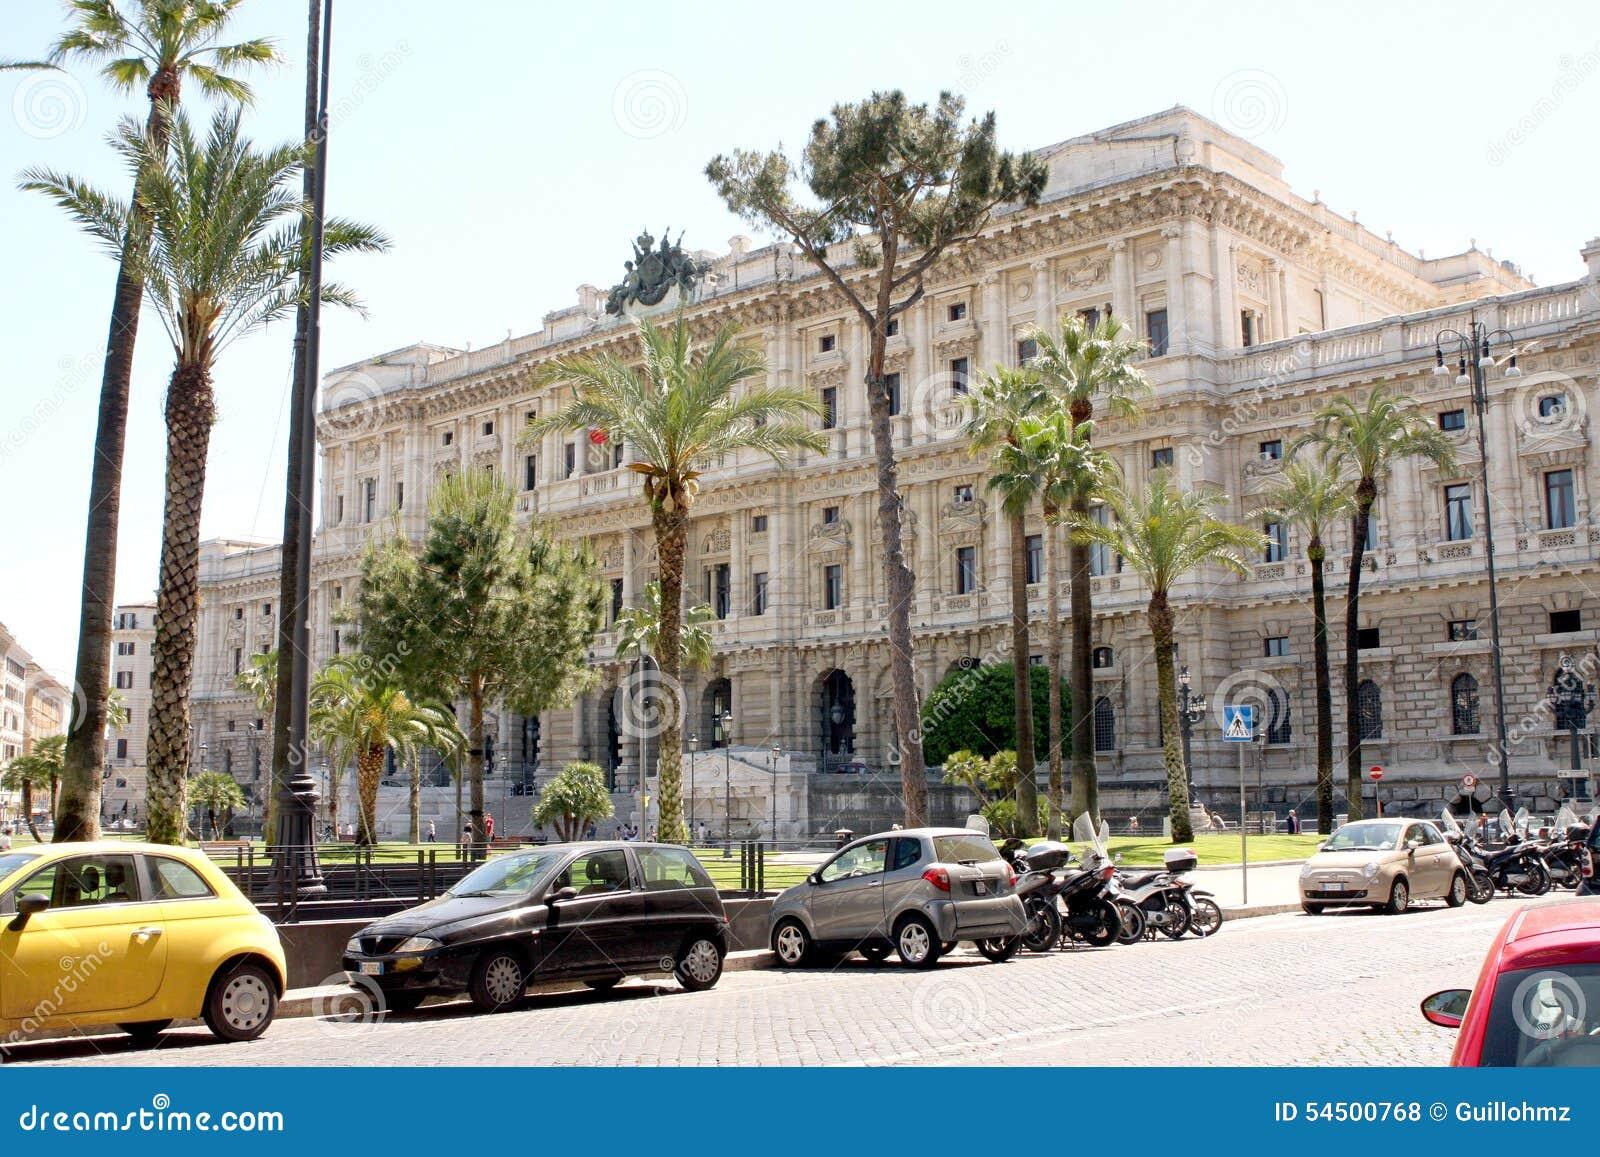 Cour de Justice suprême Rome Italy